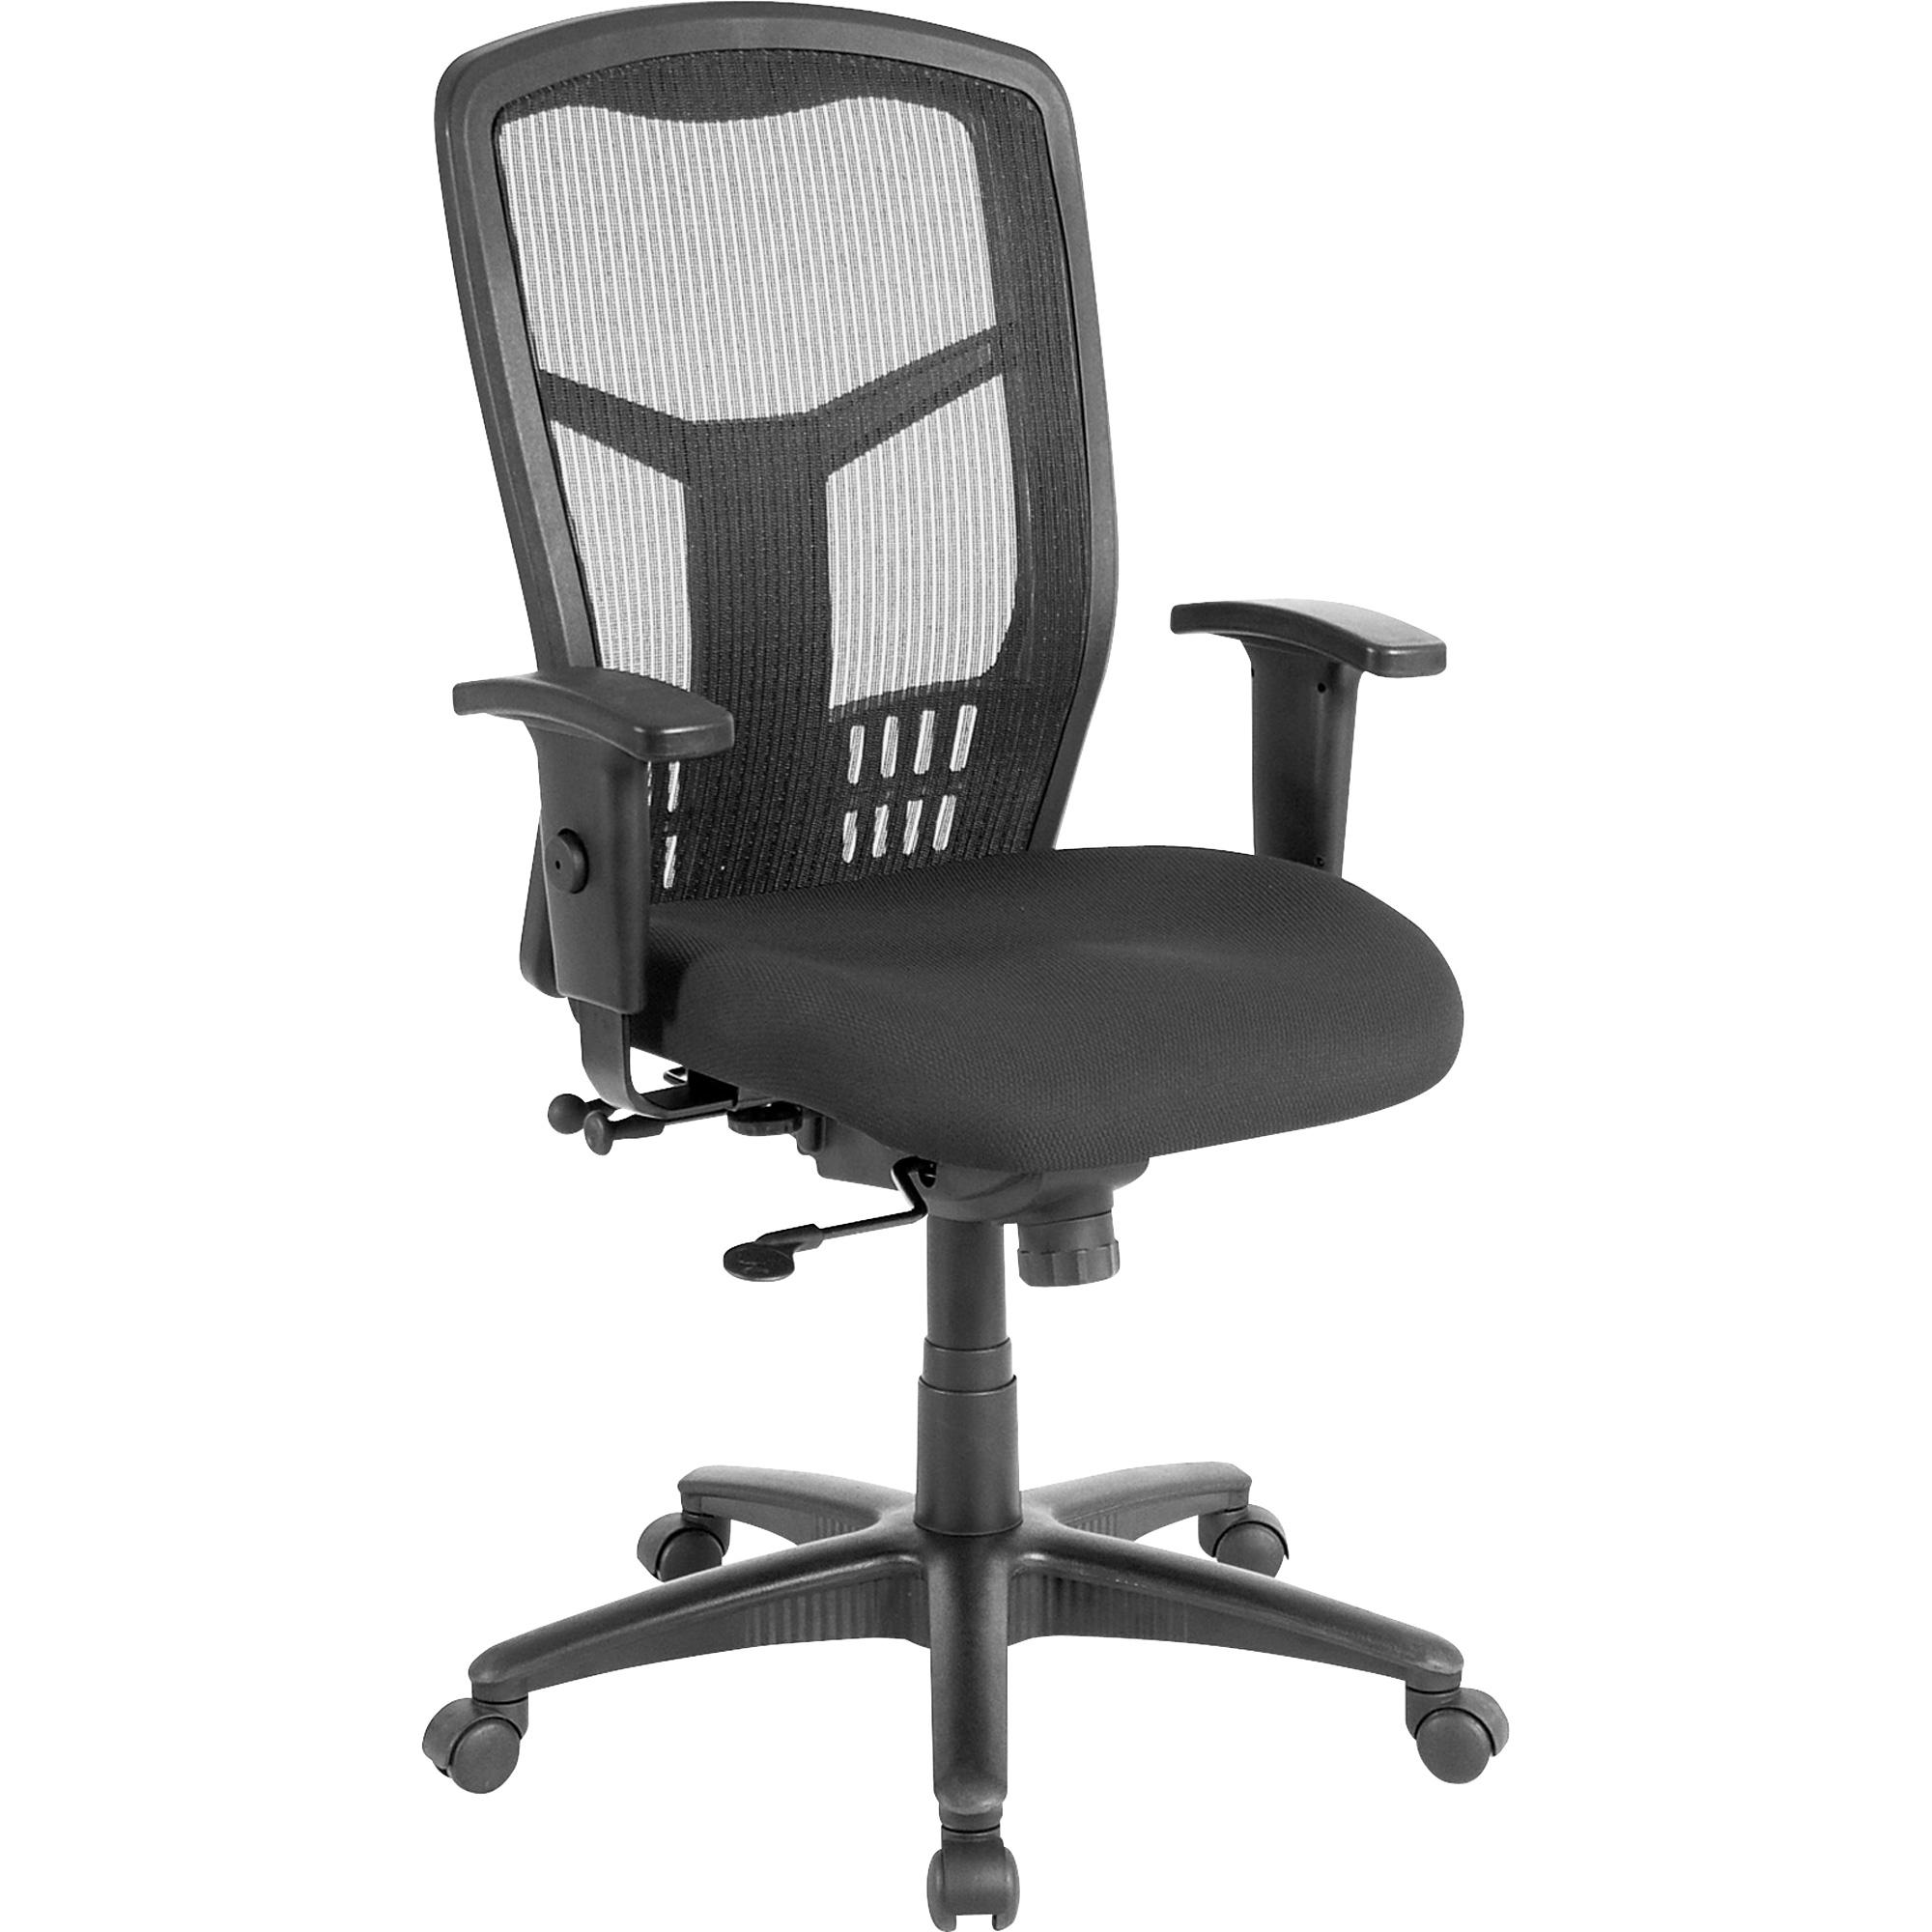 Lorell Executive High-back Swivel Chair - Fabric Black Seat - Steel Frame - Black - 28.5 Width X 28.5 Depth X 45 Height